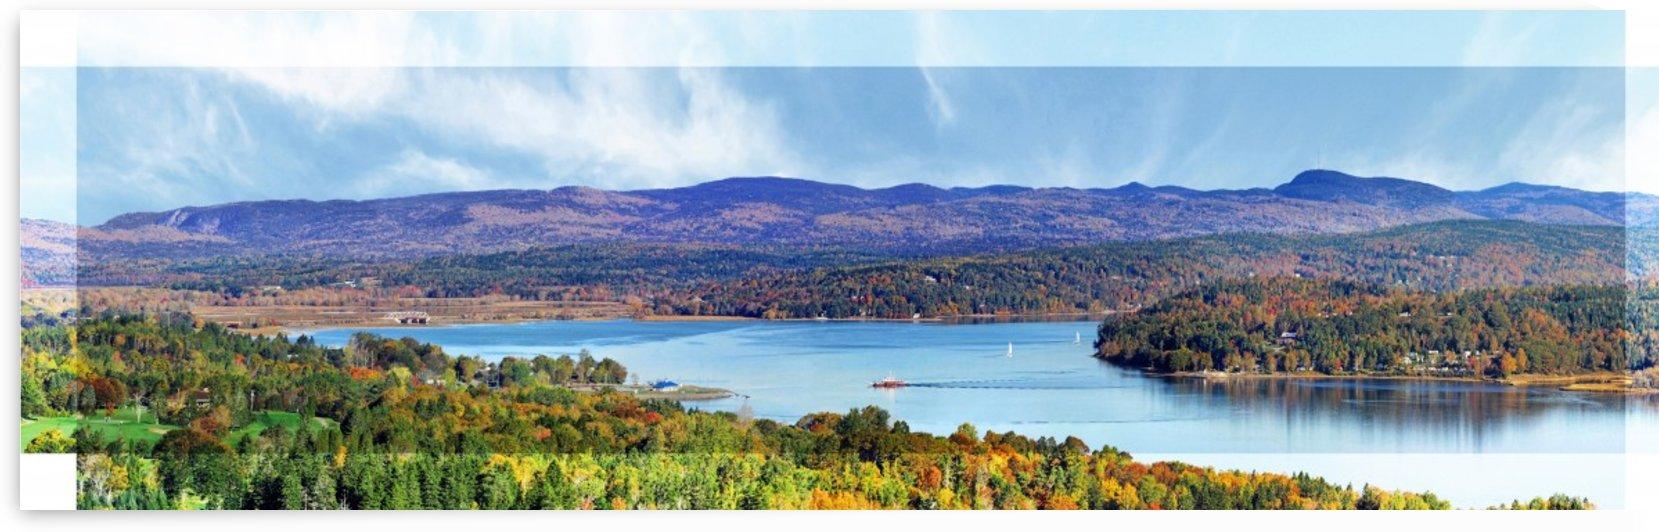 Grand Bay-Westfield New Brunswick in Autumn 48 by 12 by Doug McQuinn